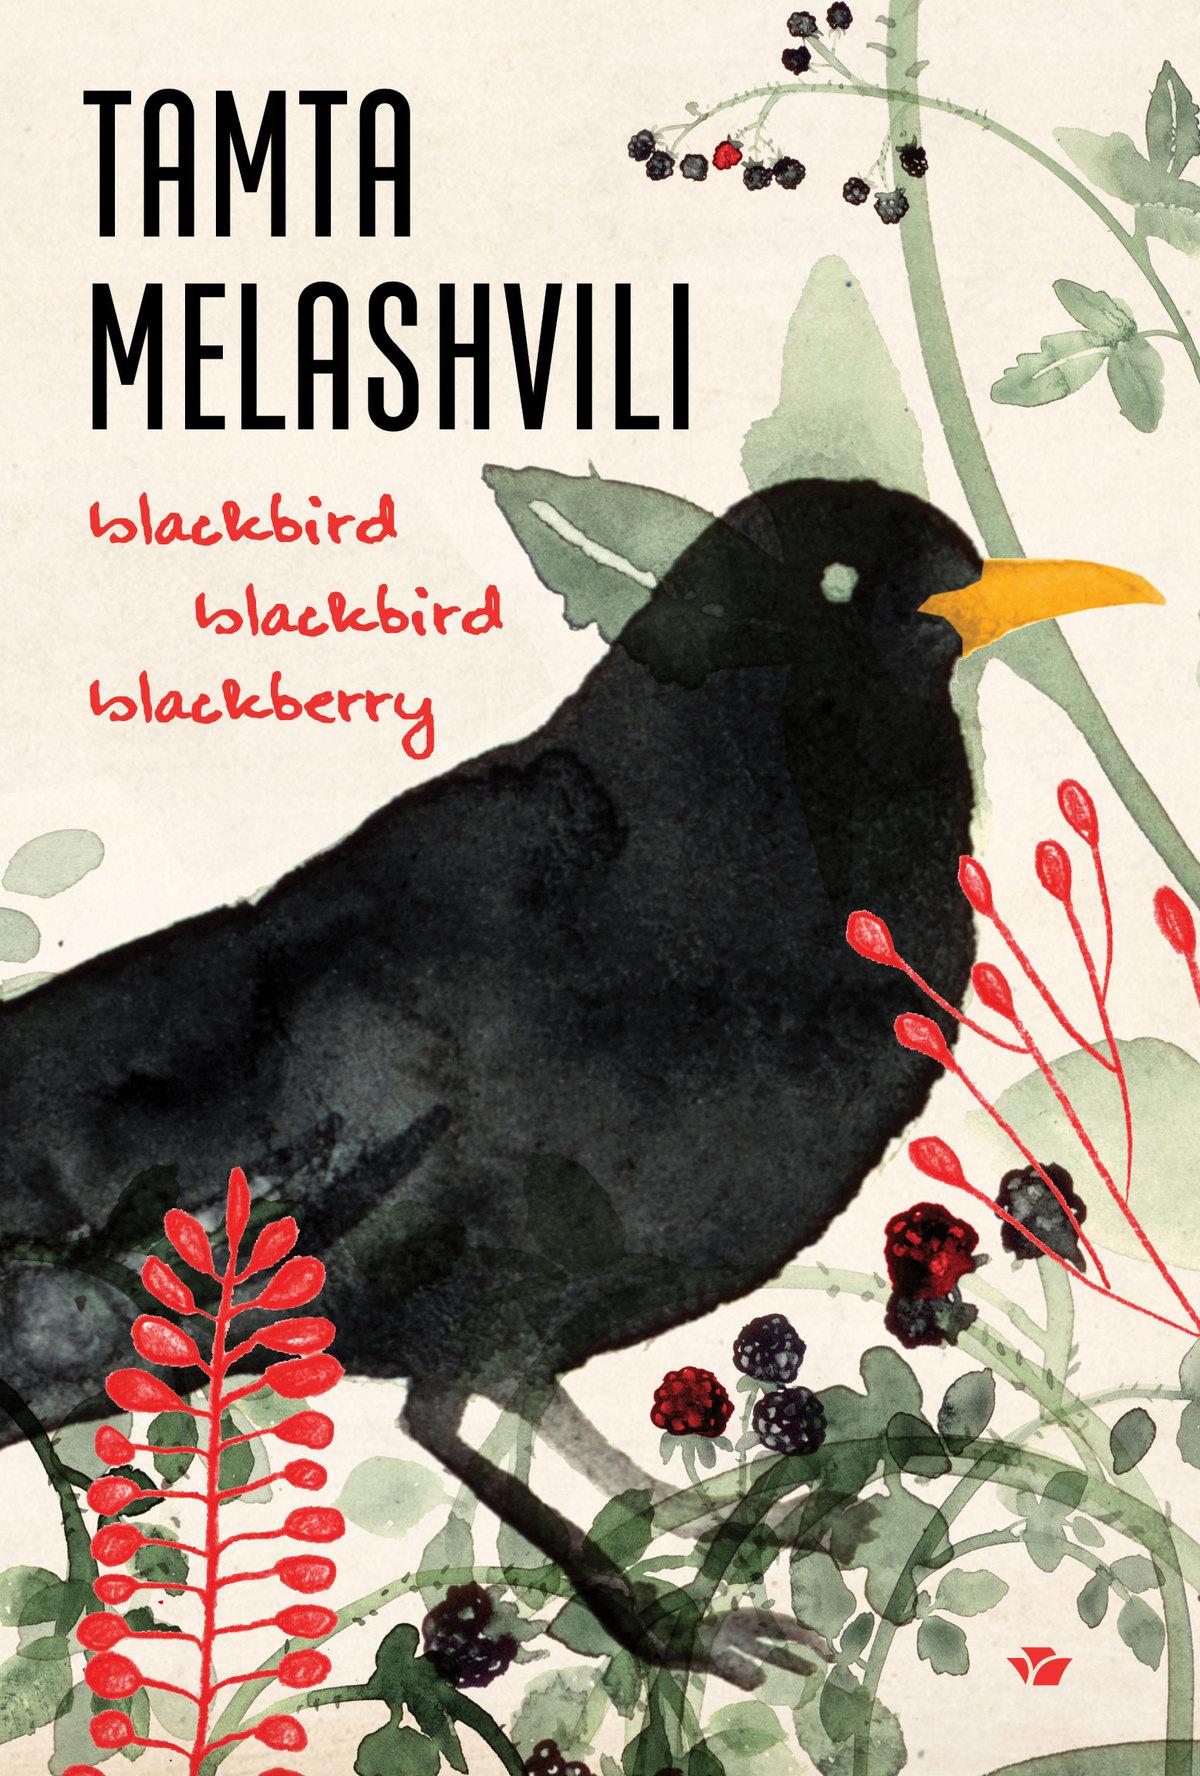 Blackbird_Blackbird_Blackberry_cover_1